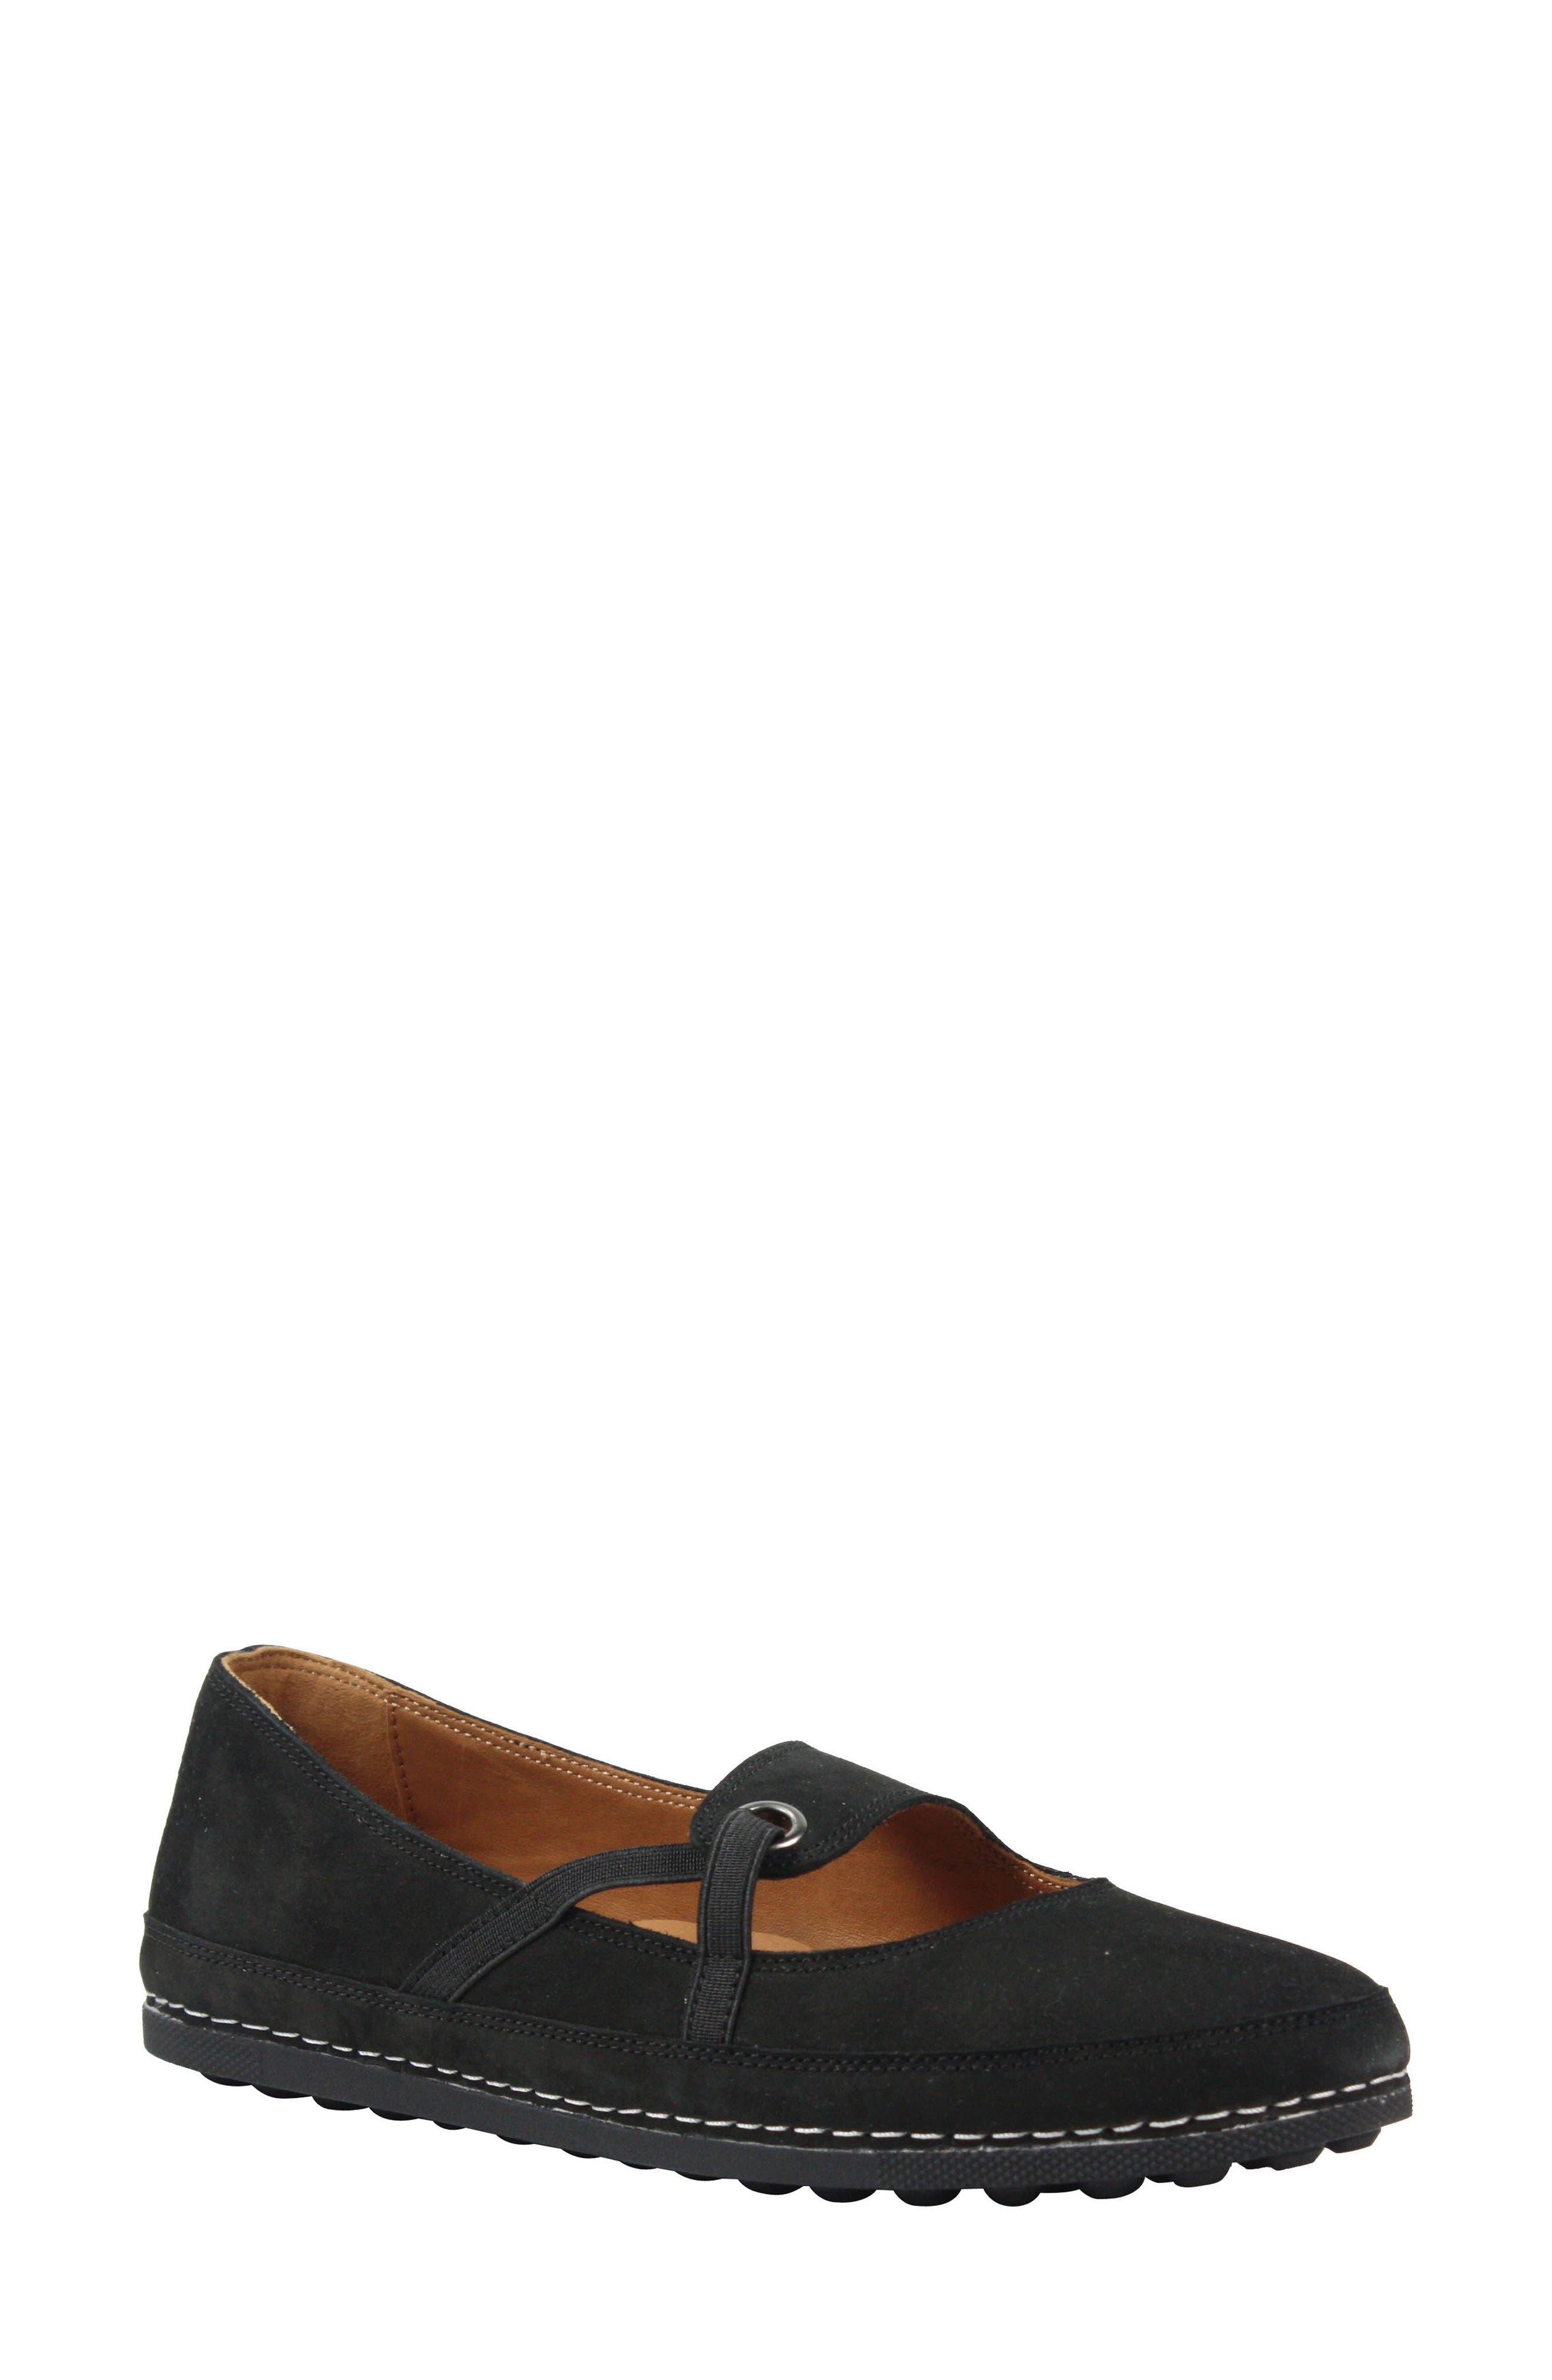 Denisse Mary Jane Flat,                             Main thumbnail 1, color,                             Black Nubuck Leather